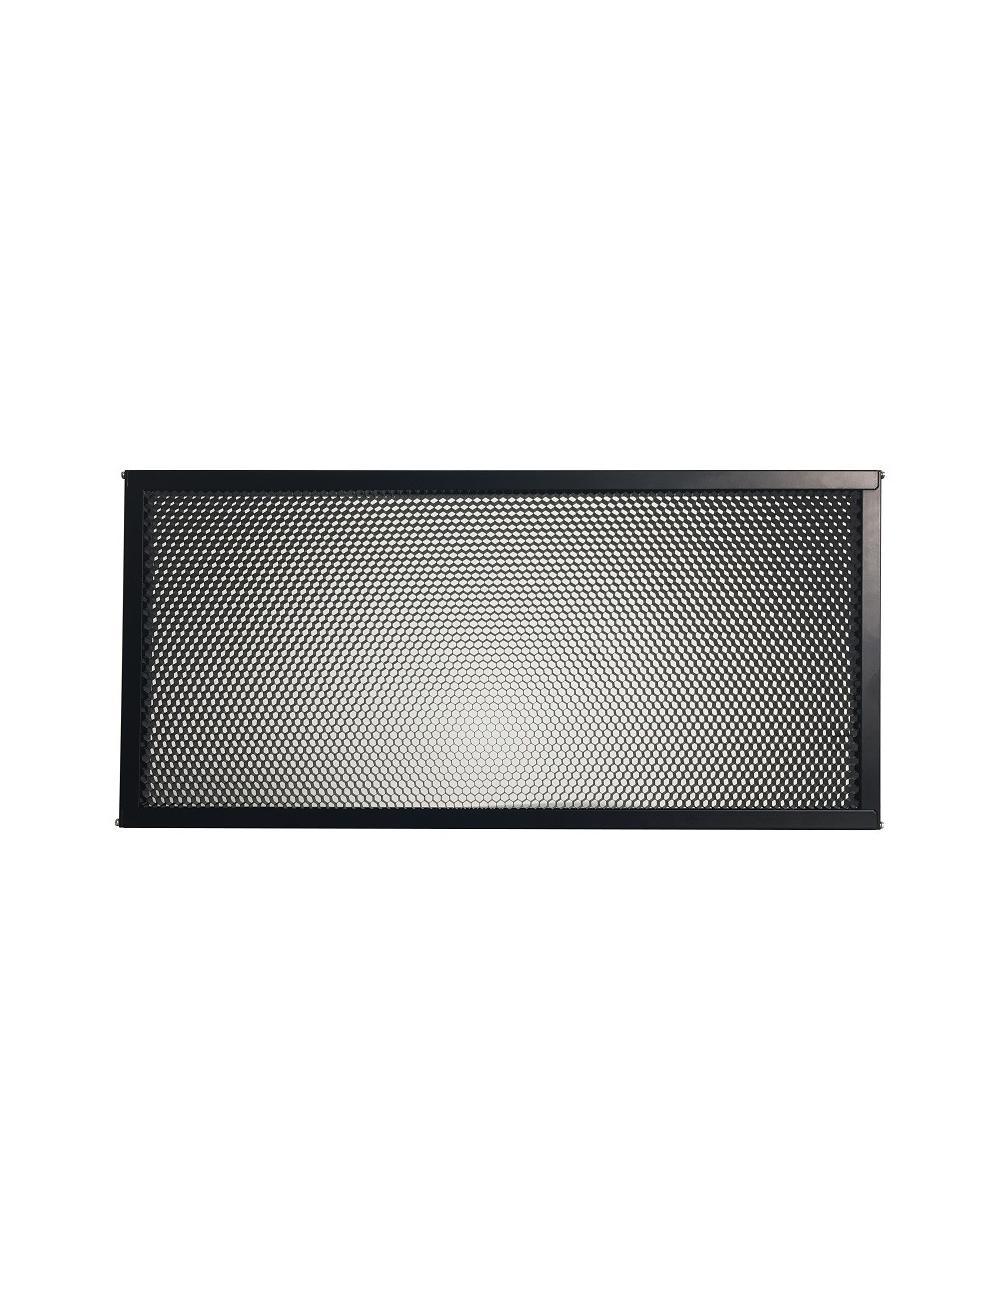 Litepanels Honeycomb 60 Deg Gemini